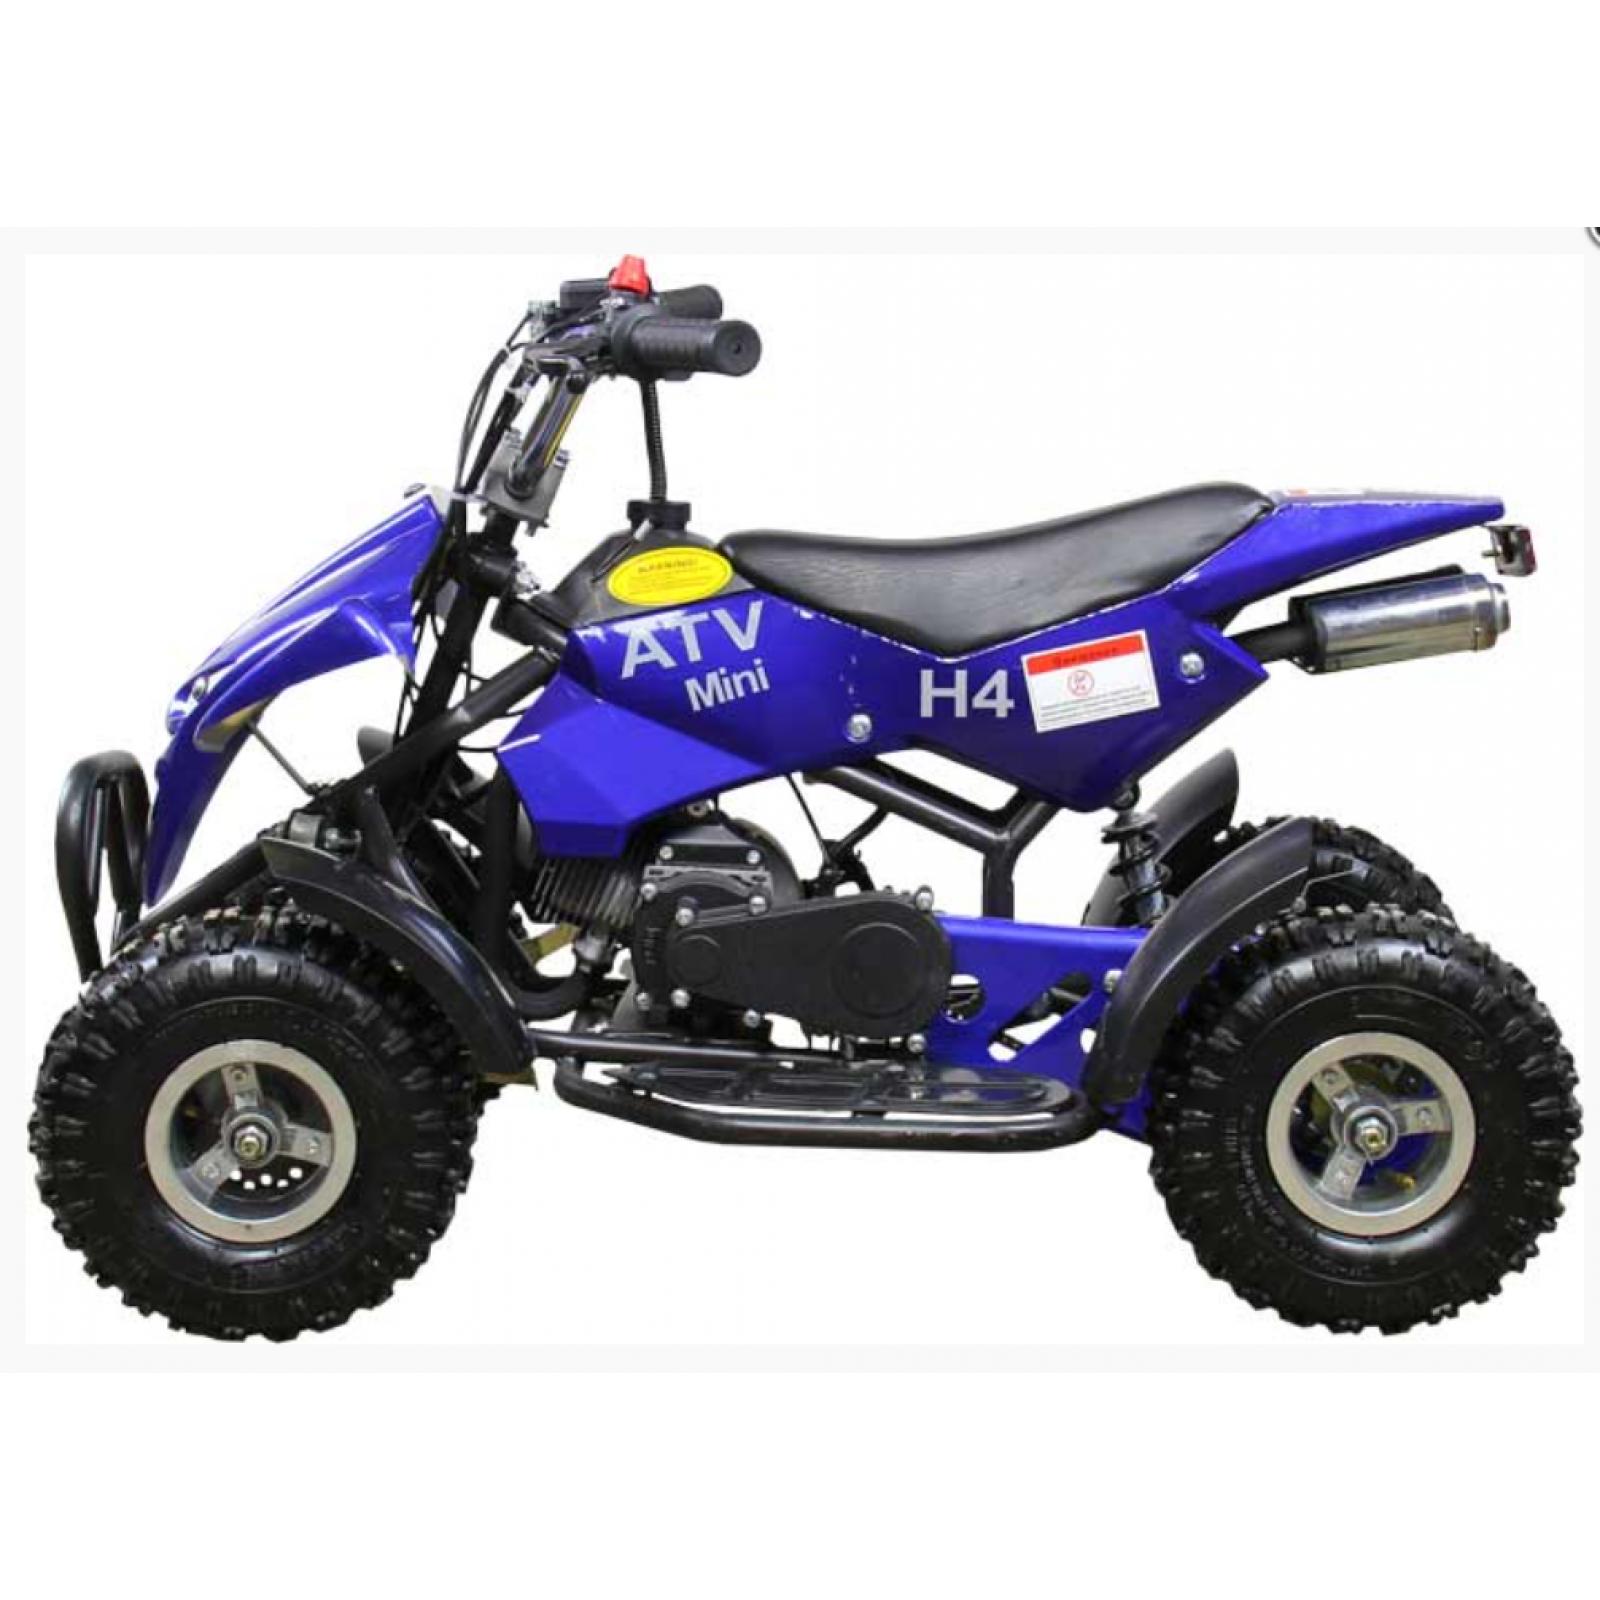 Квадроцикл ATV H4 MINI 2T